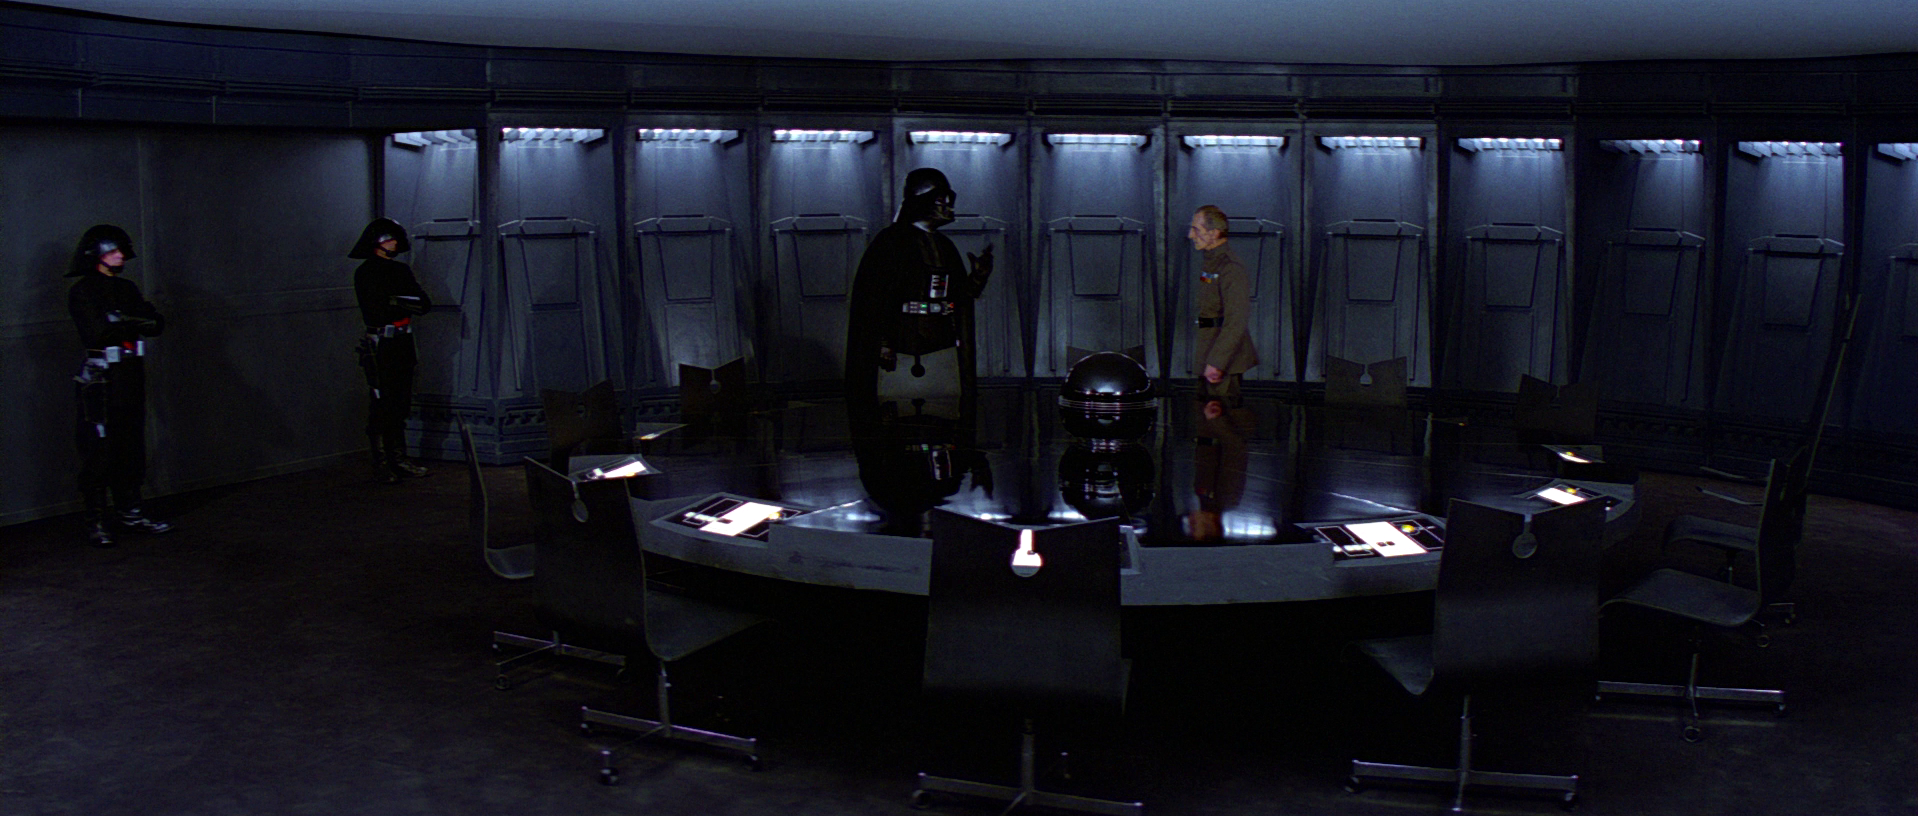 Death Star Conference Room Wookieepedia Fandom Powered